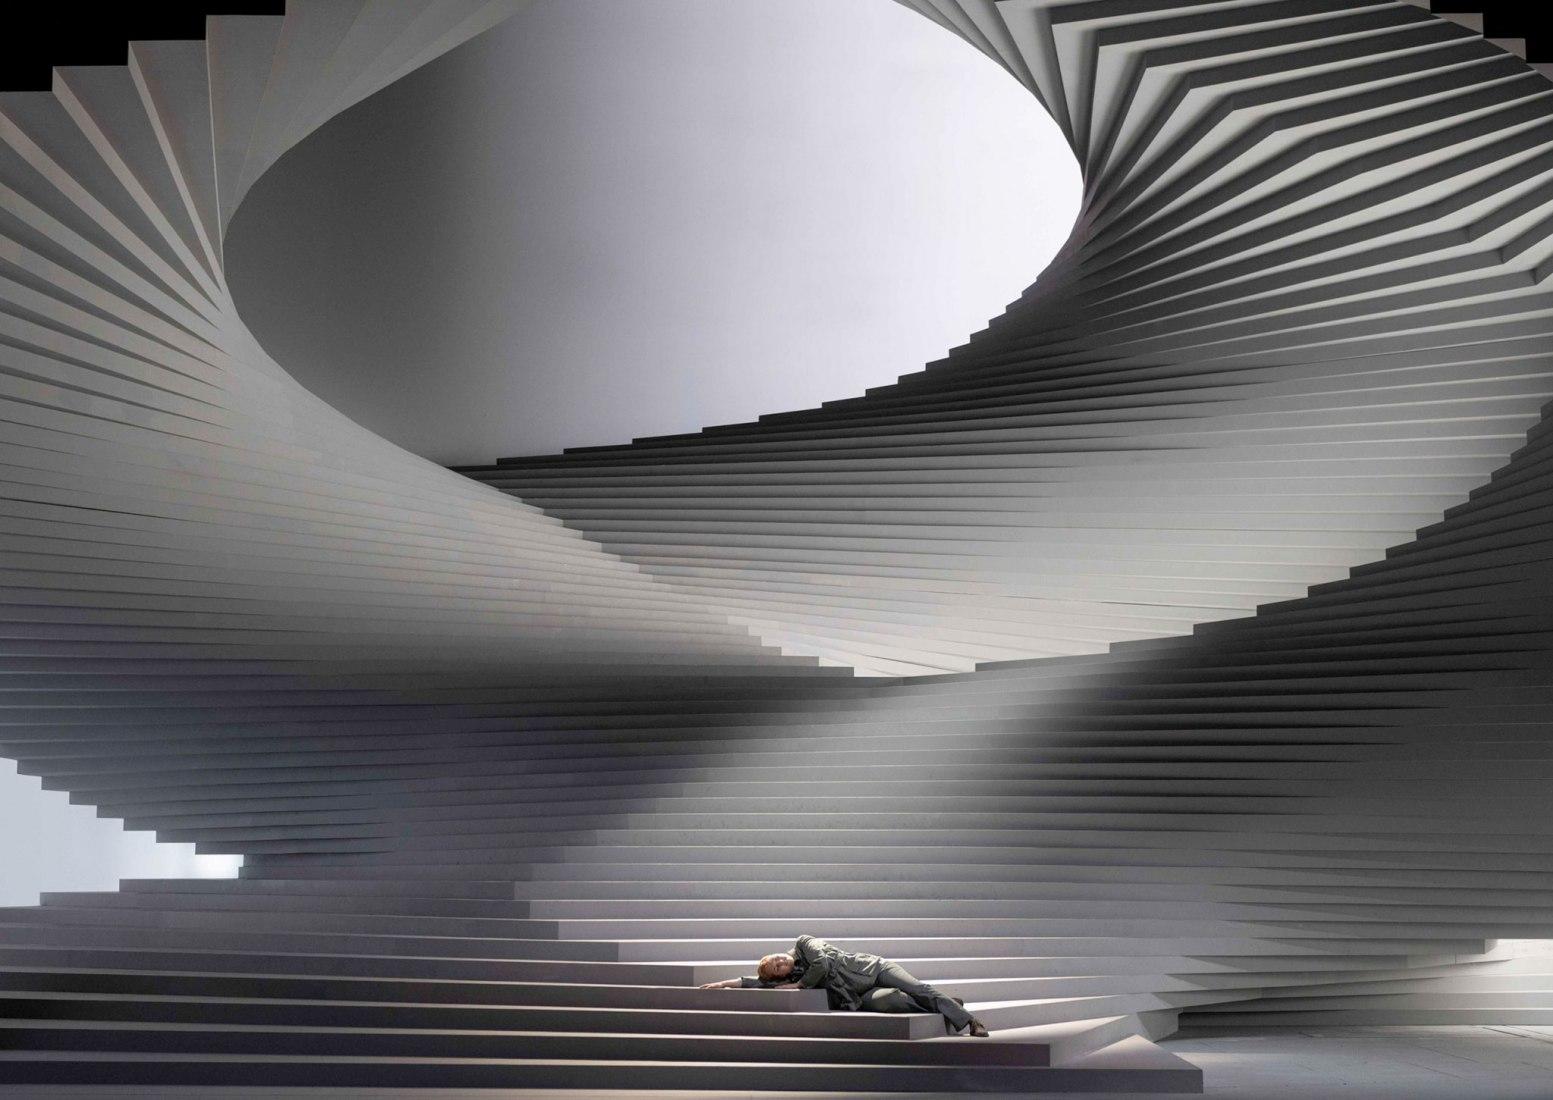 Barkow Leibinger's set for the Fidelio opera in Vienna. Photograph by Monika Rittershaus